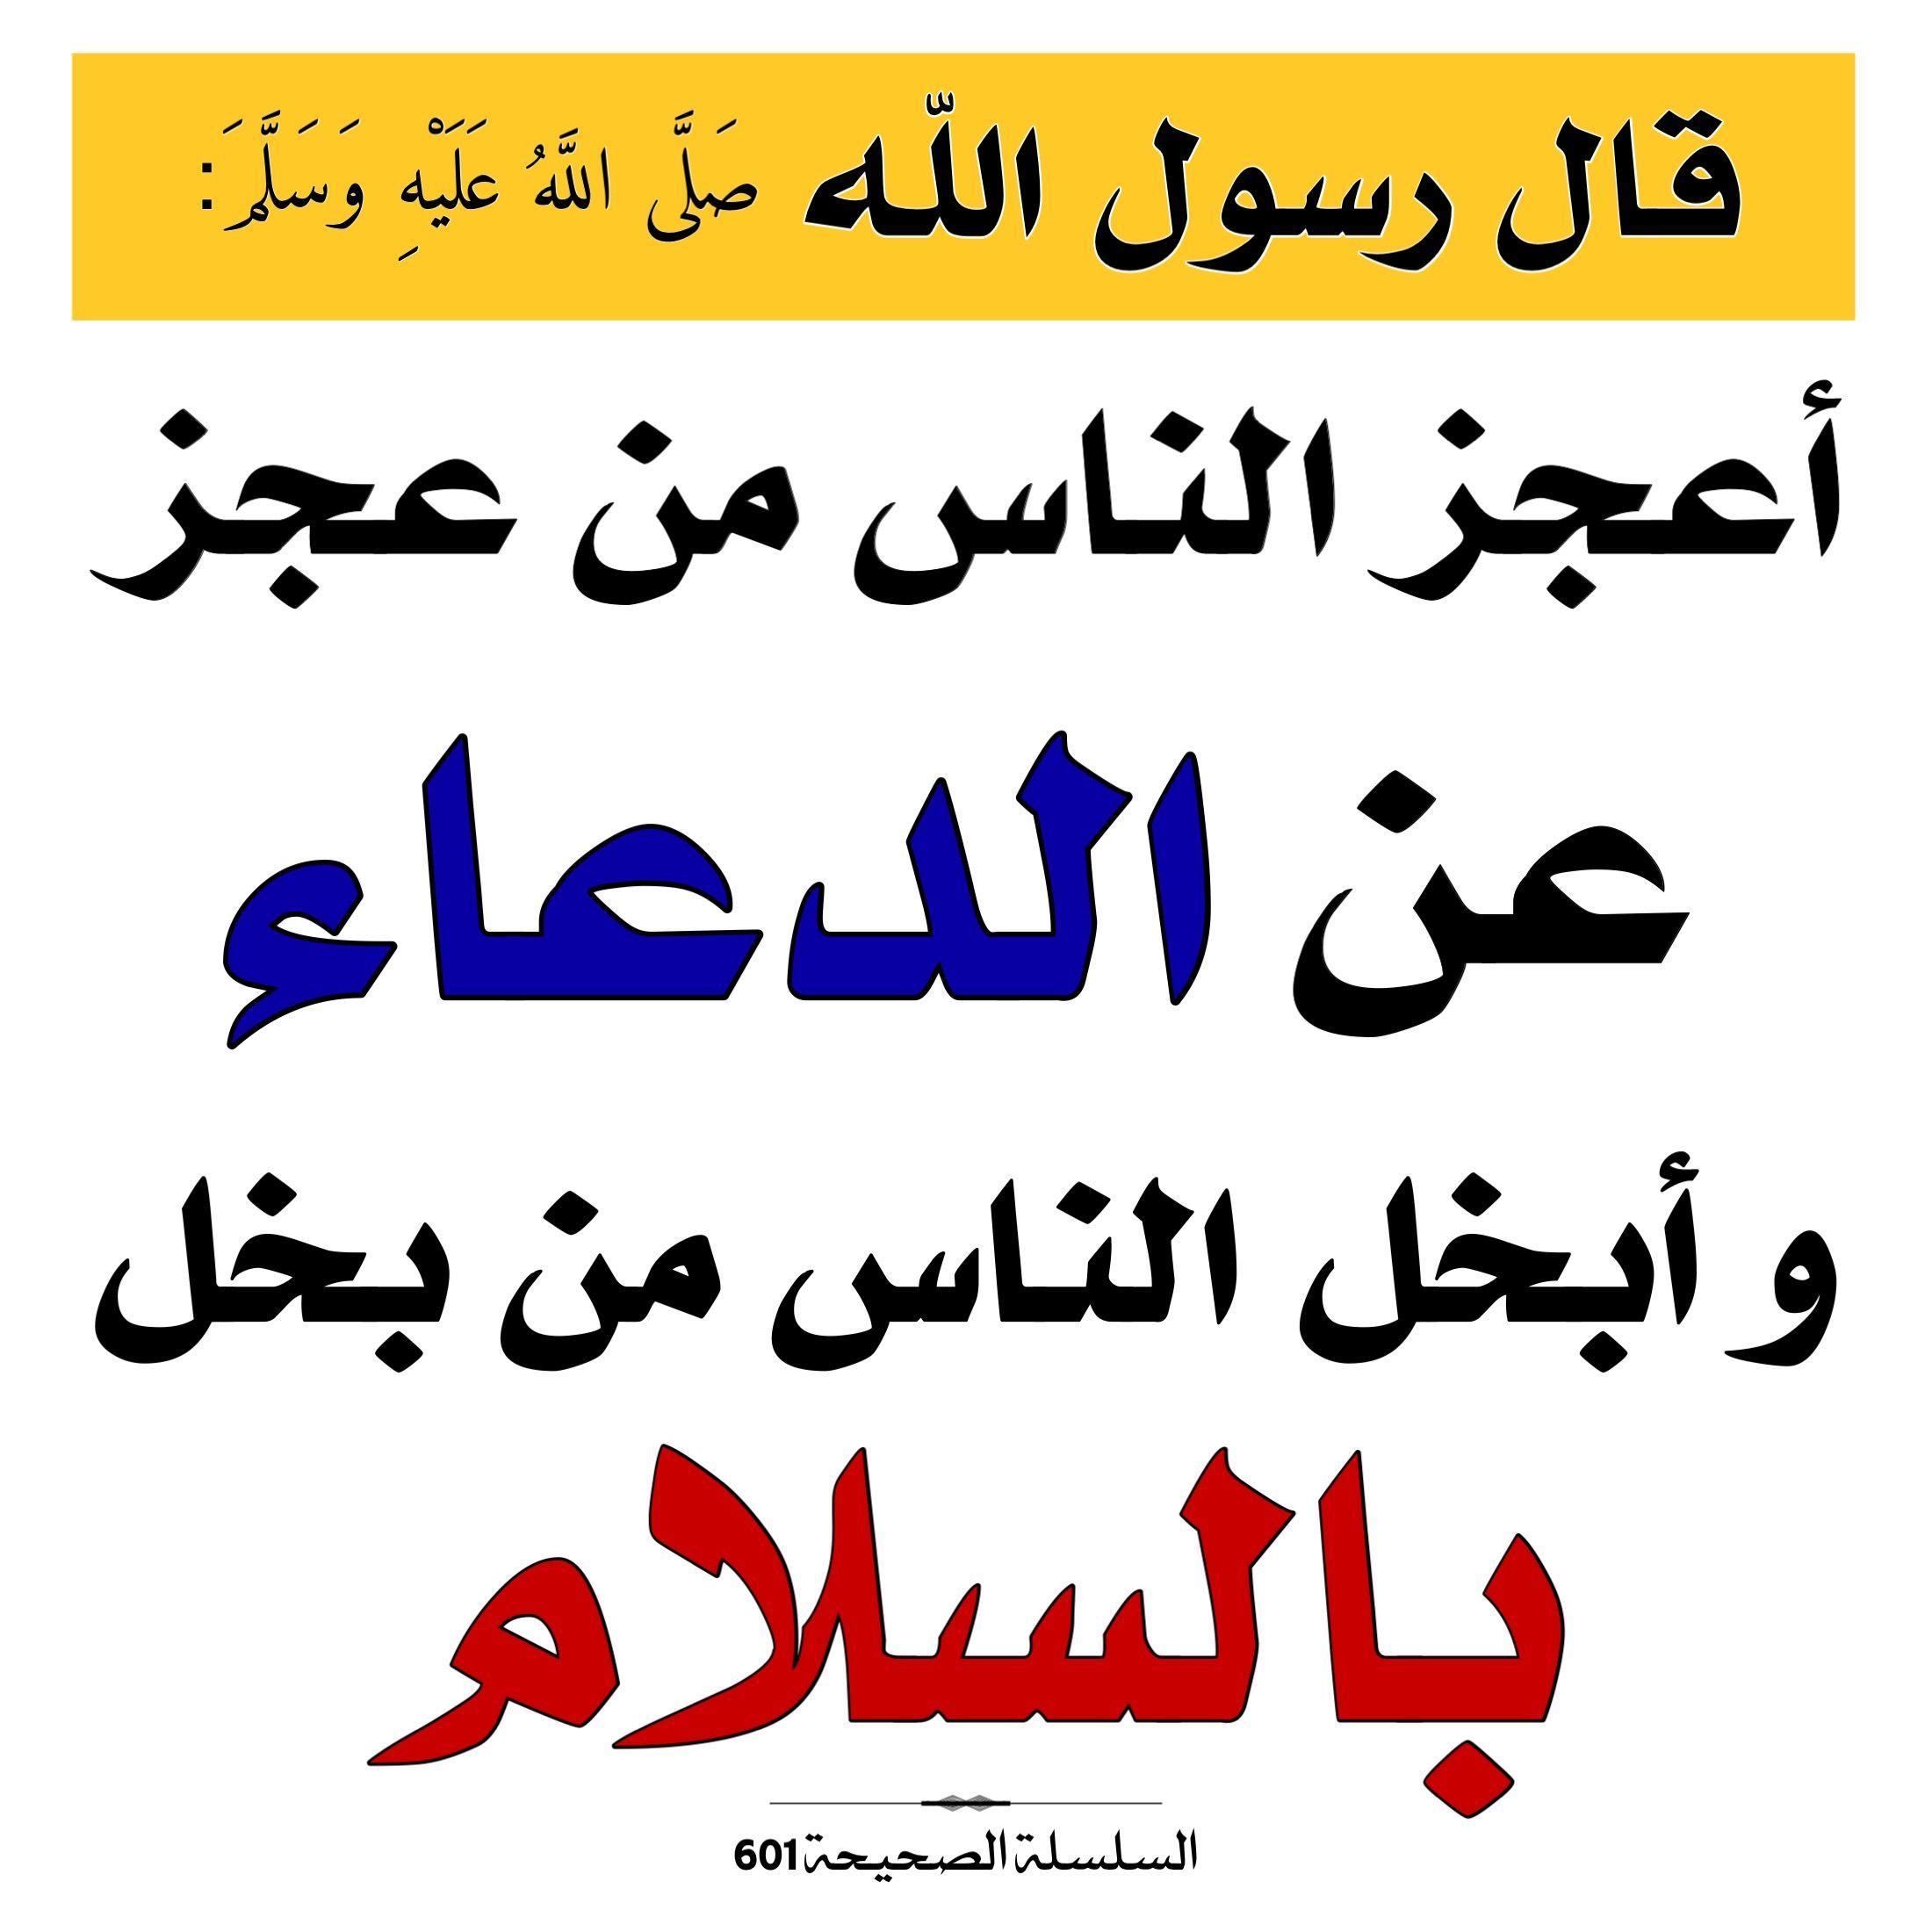 Pin By الأثر الجميل On أحاديث نبوية Words Arabic Calligraphy Calligraphy